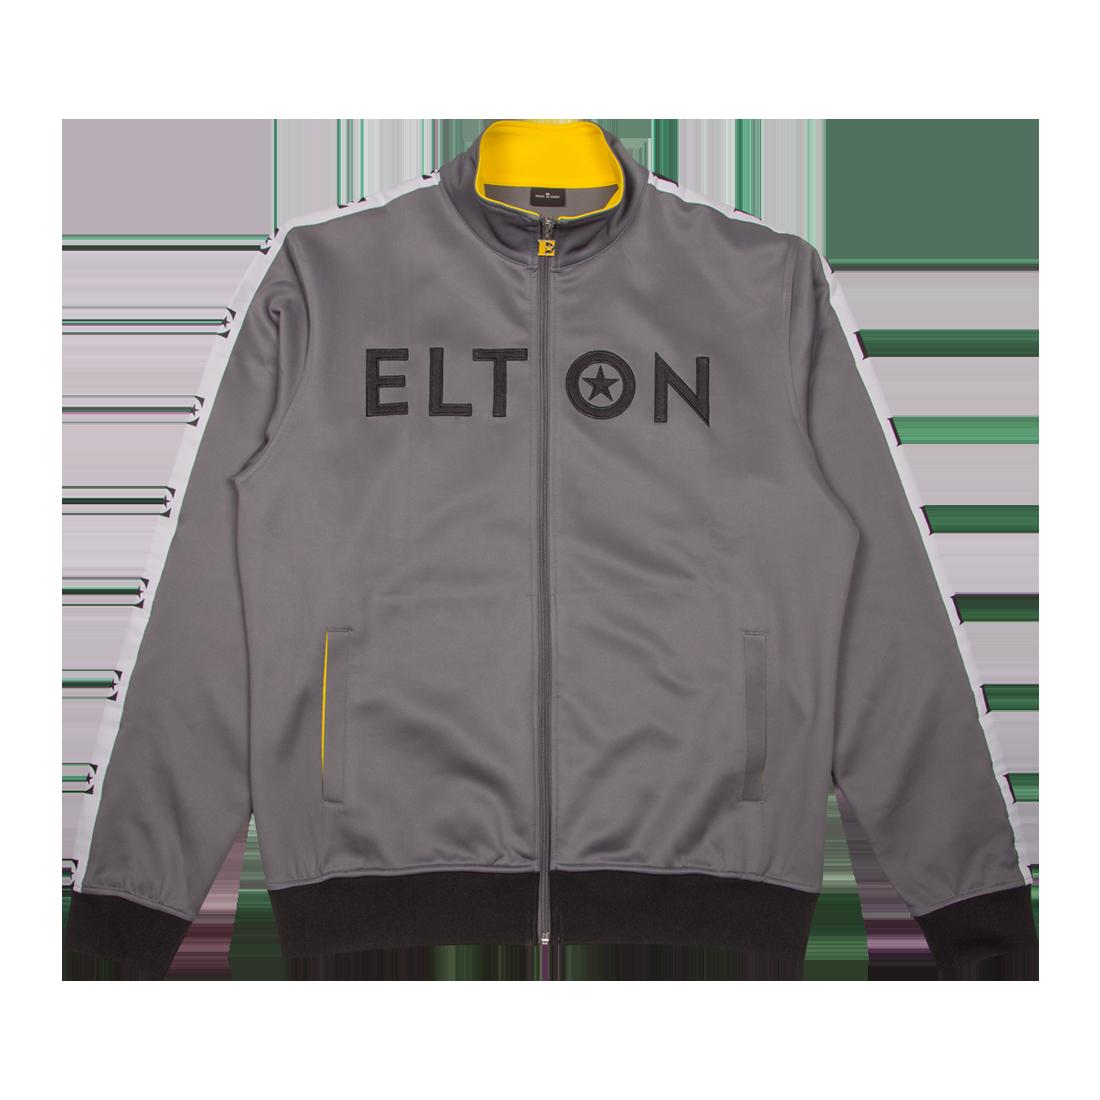 Elton John: Taped Track Jacket - S